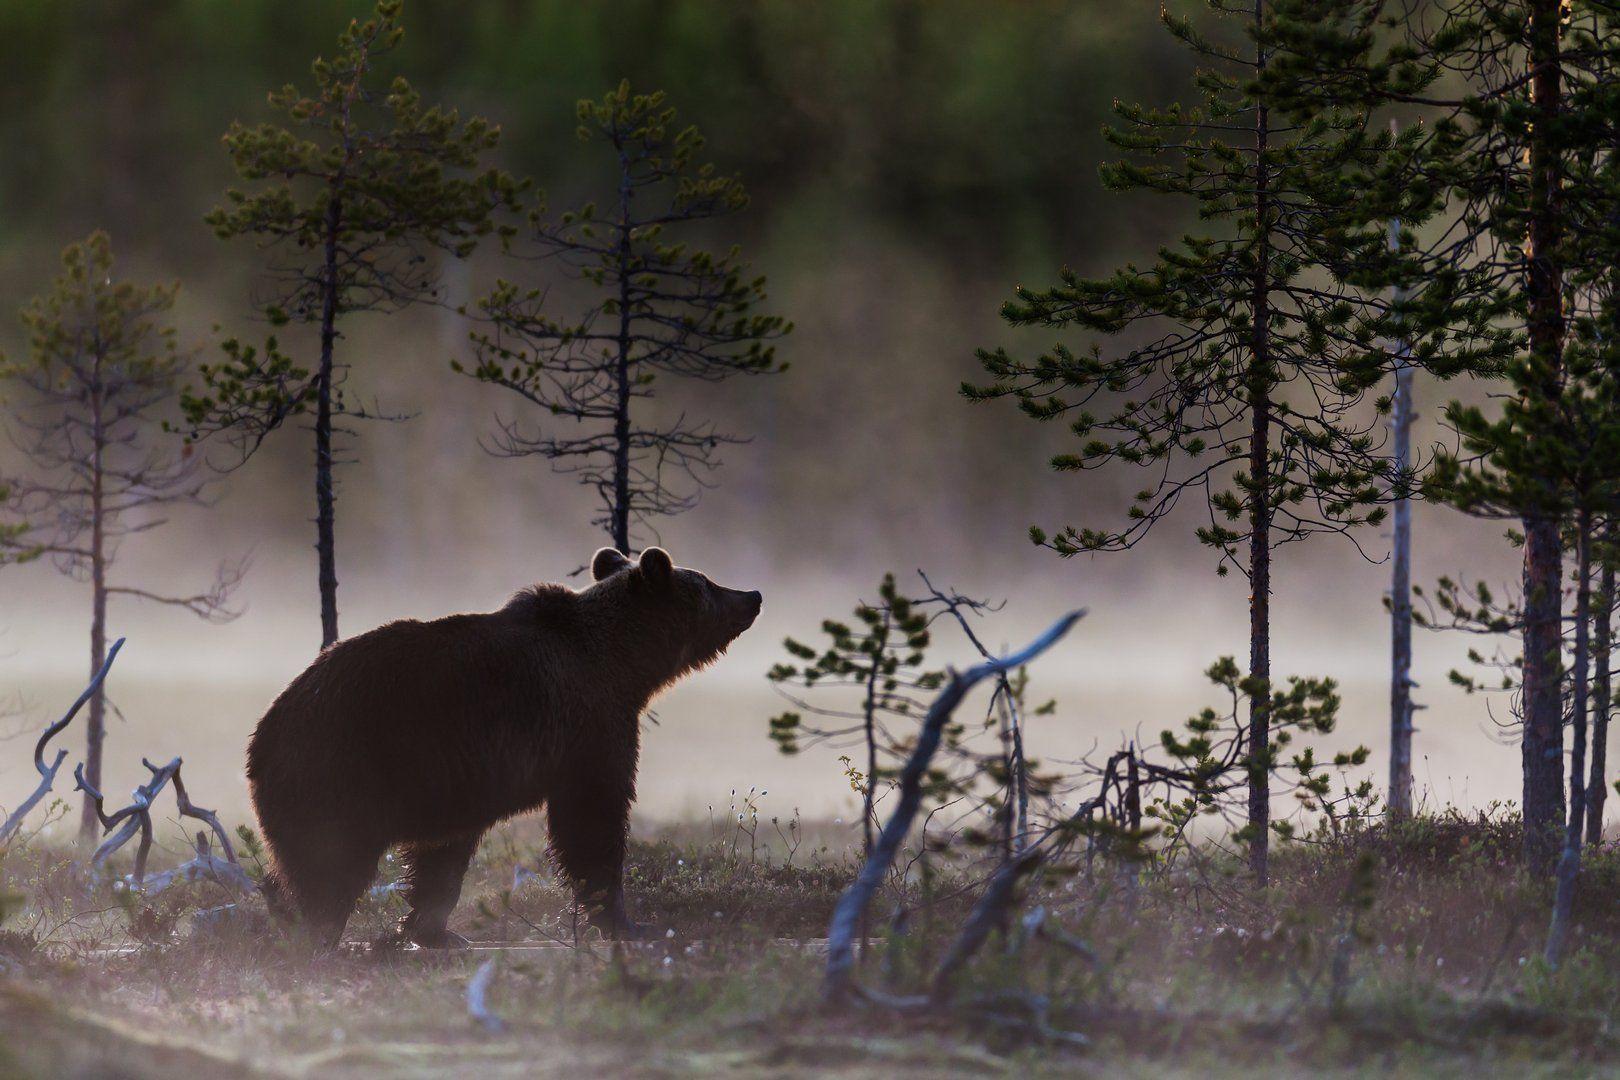 белые ночи, болото, бурый медведь, карелия, лес, туман, фотоохота, Роман Мурушкин